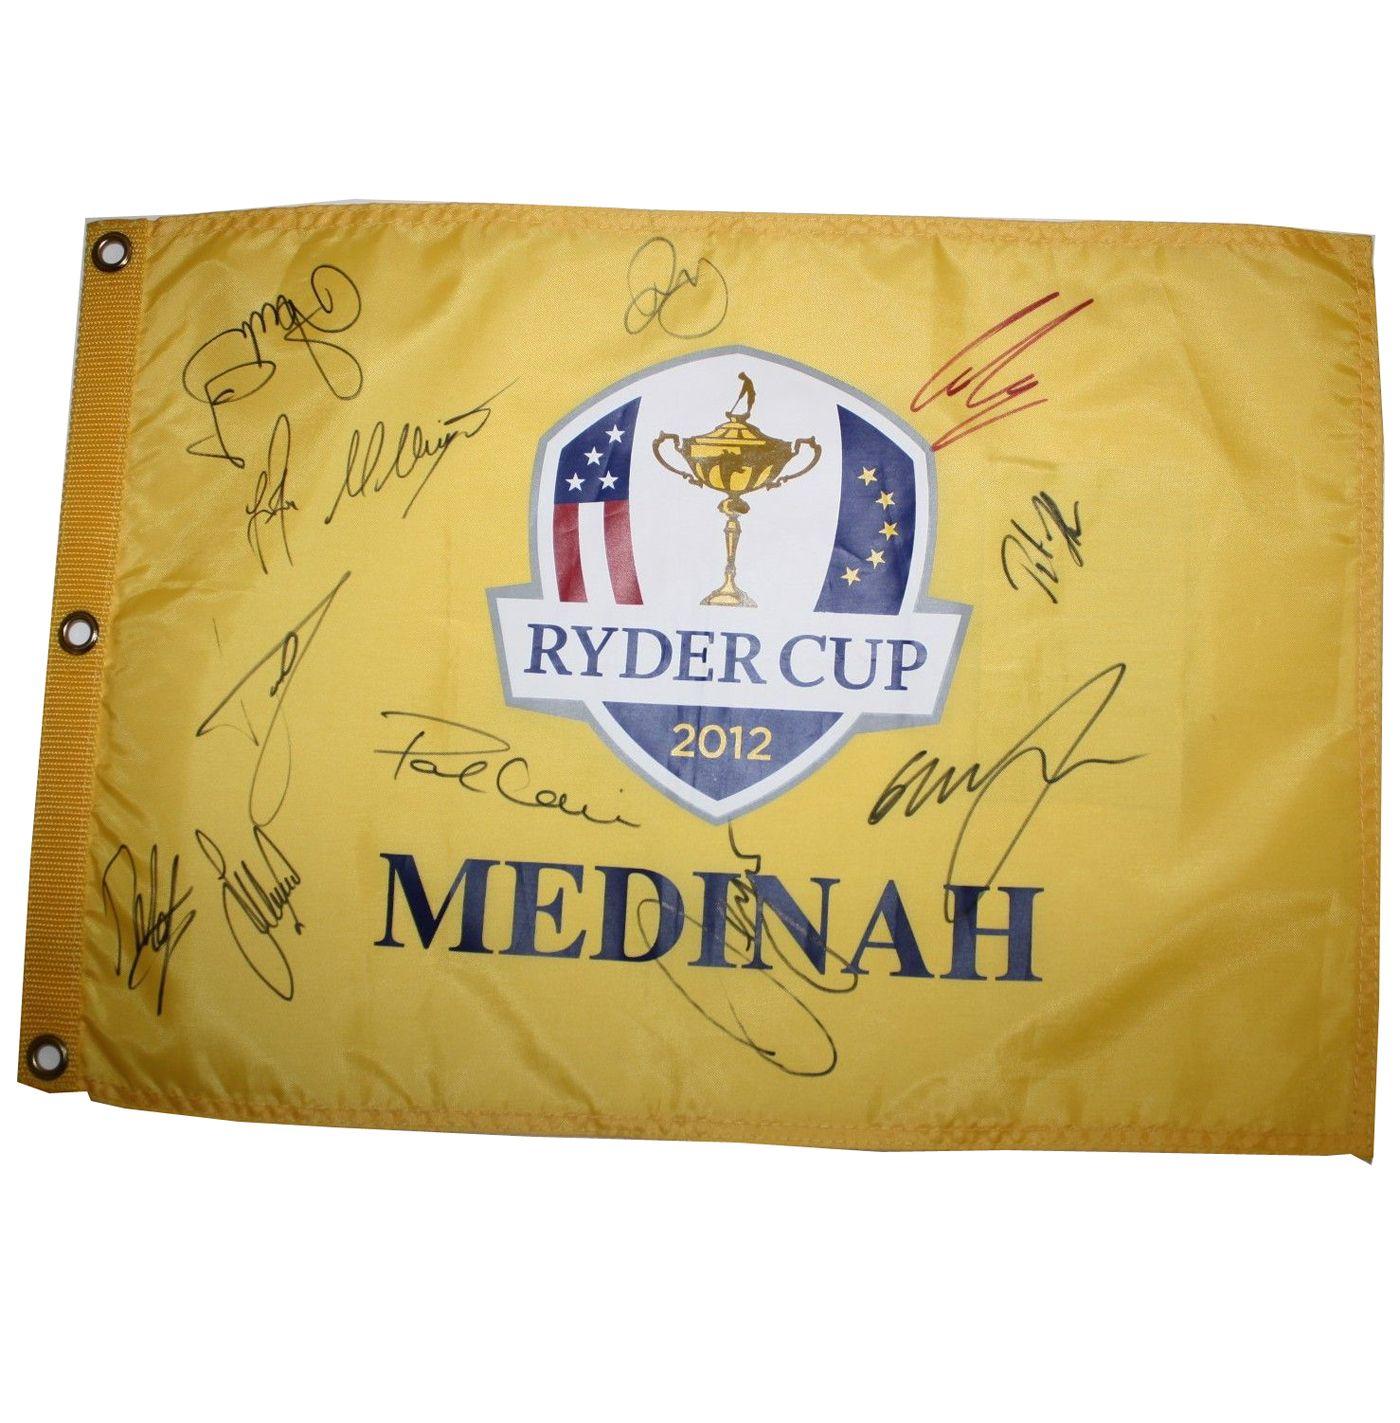 lot detail - 2012 team europe signed ryder cup flag